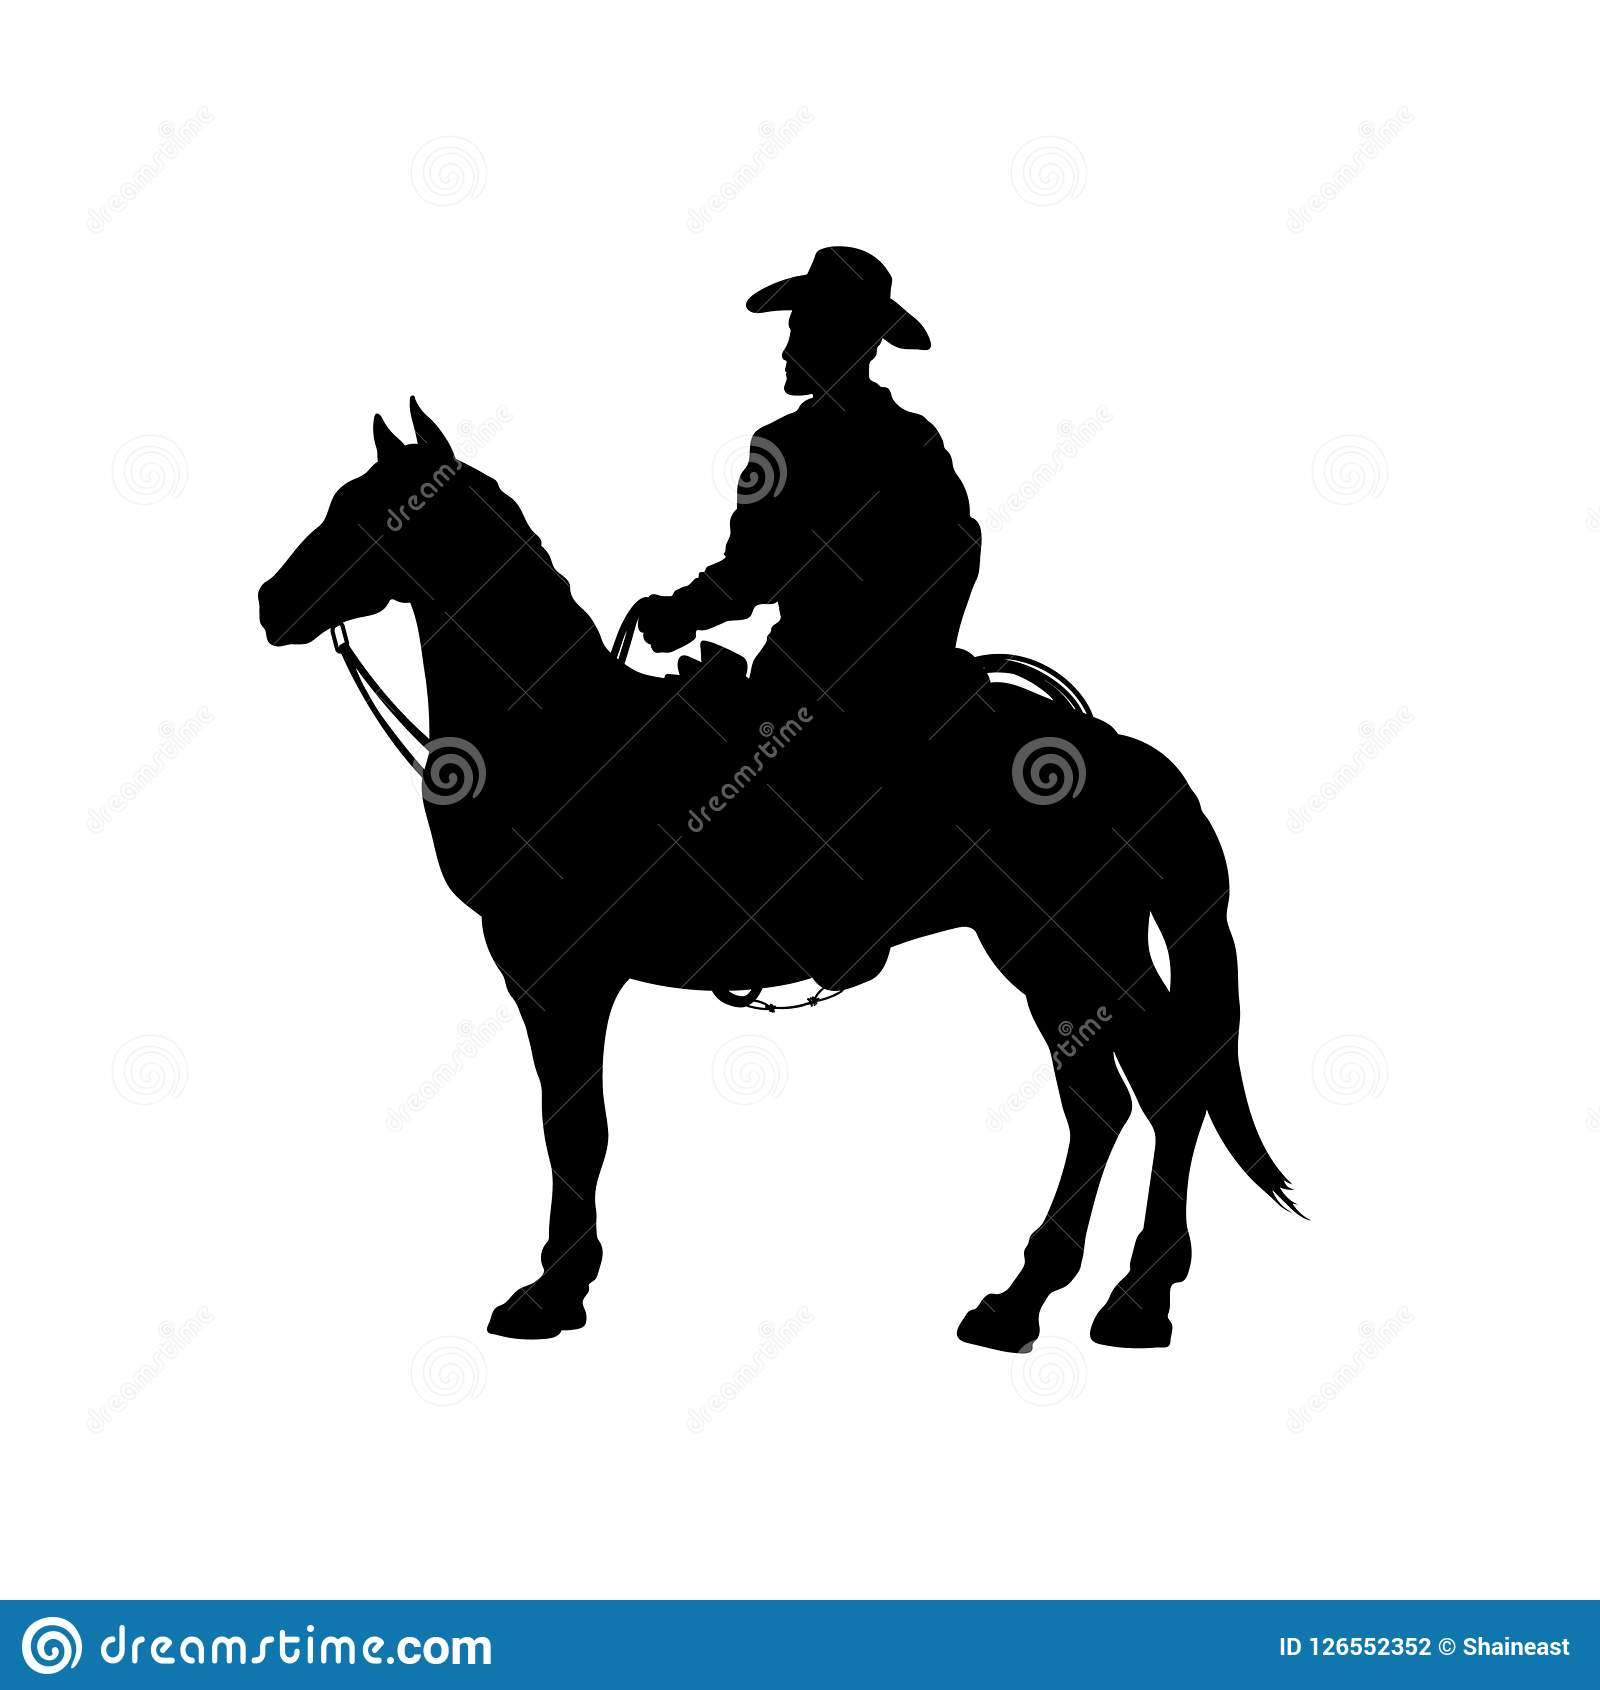 black silhouette of cowboy